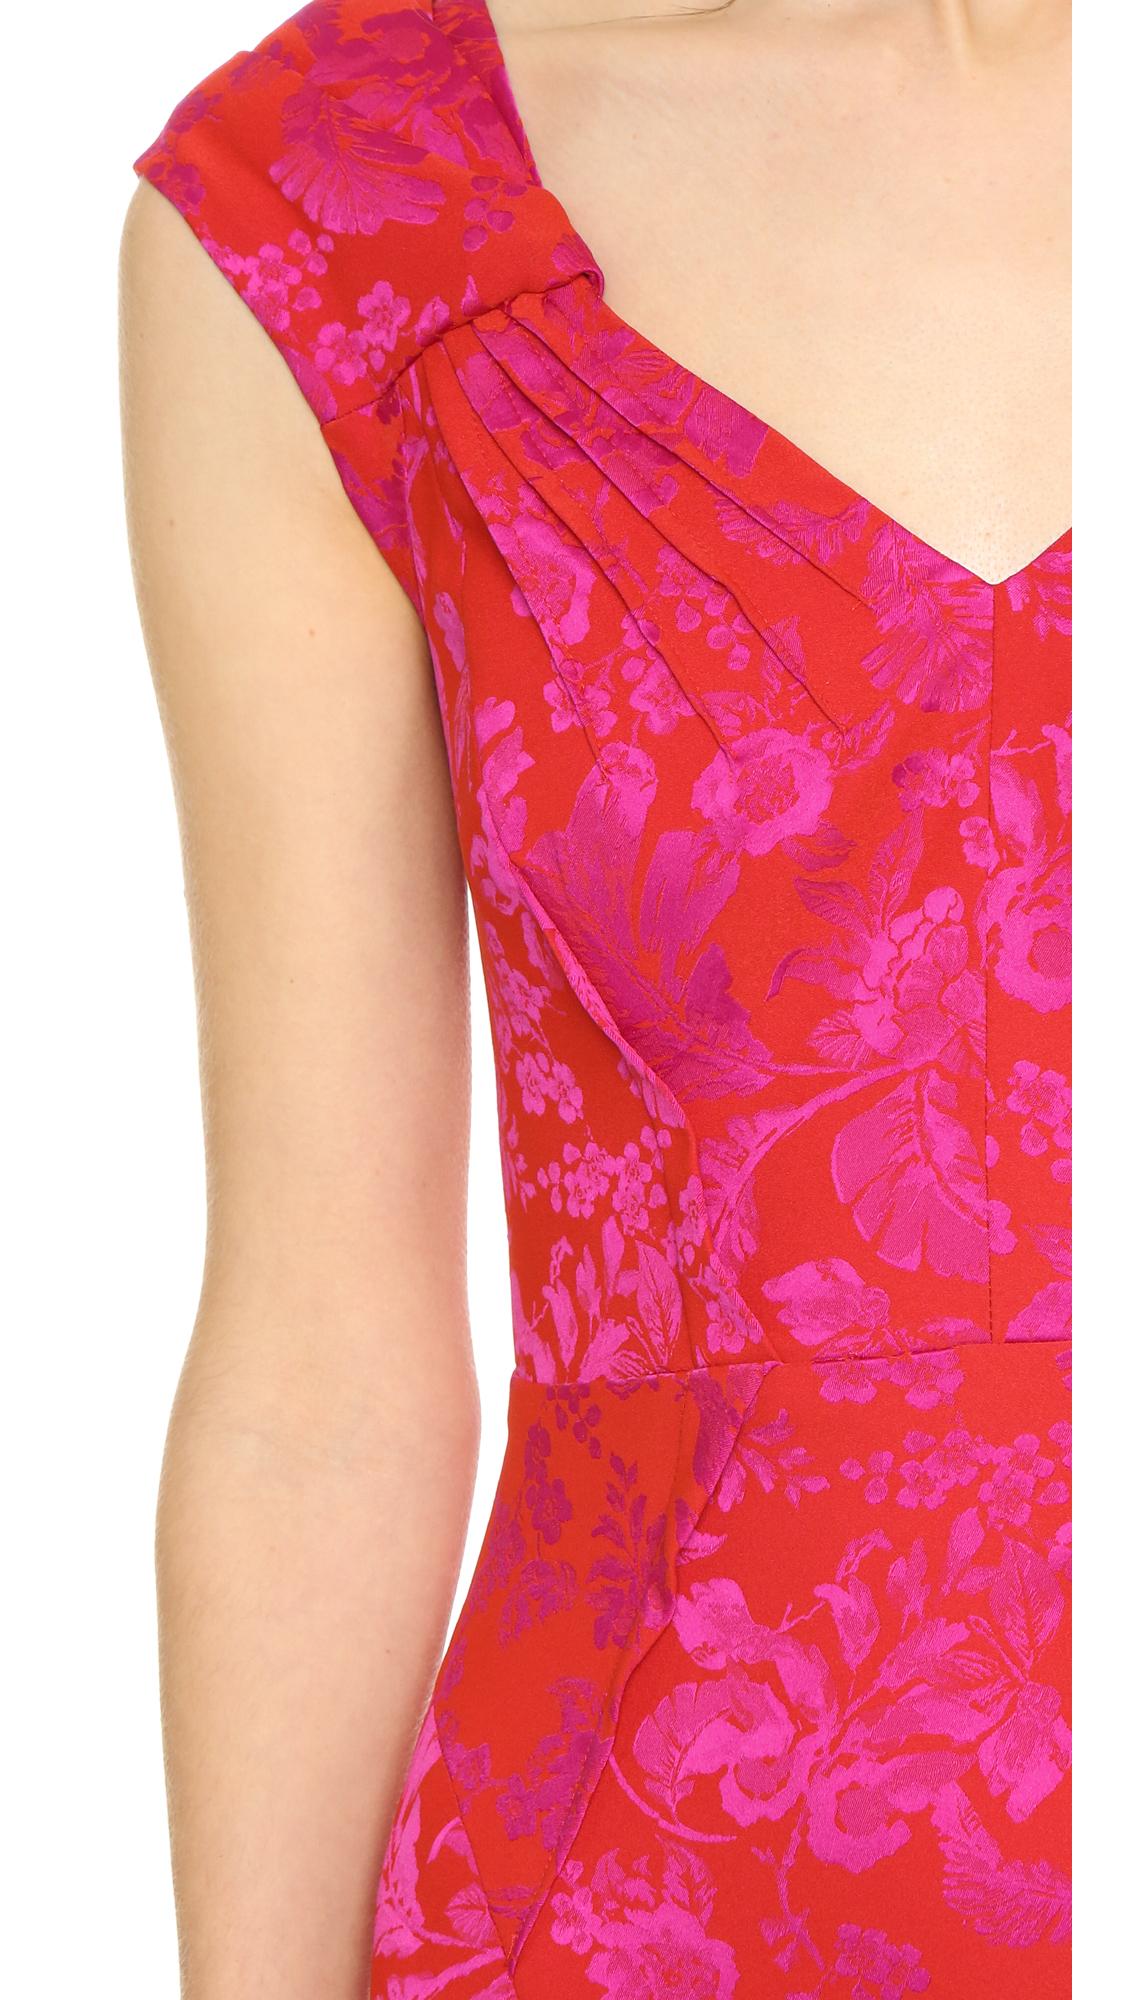 Lyst - Zac Posen Cap Sleeve Gown in Pink